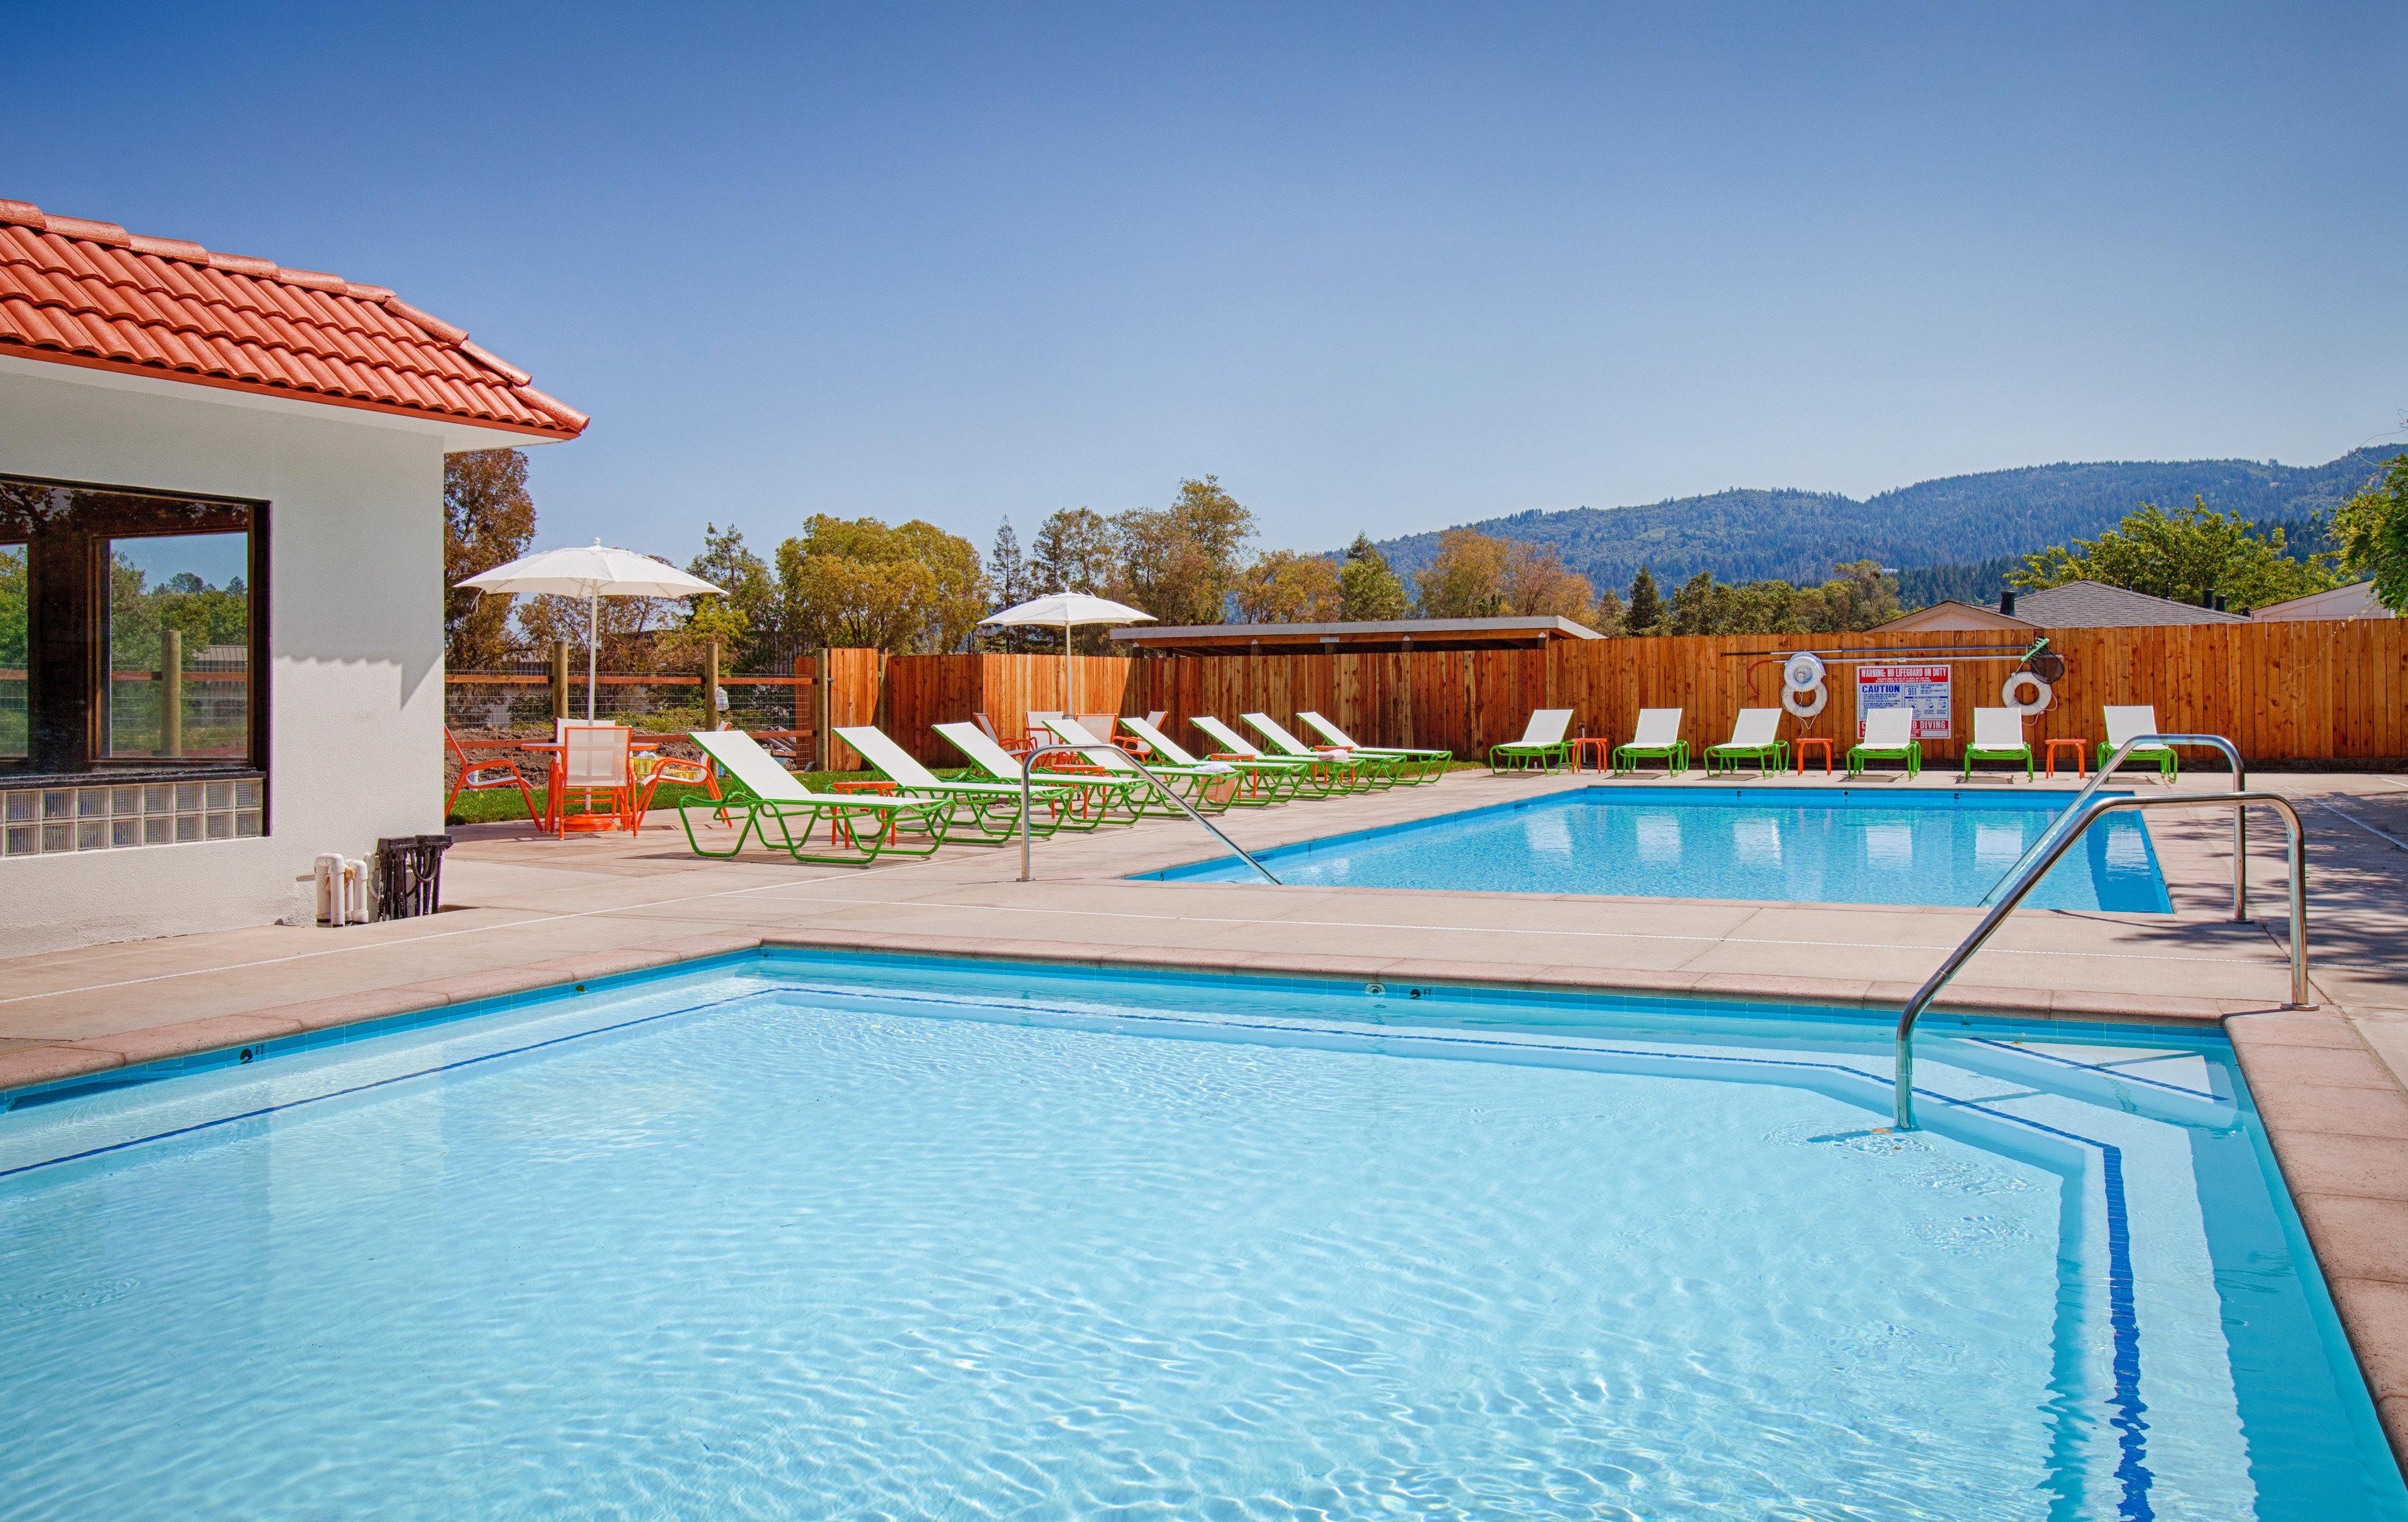 Deck Lounge Modern Patio Pool swimming pool leisure property building Resort Villa backyard home blue swimming